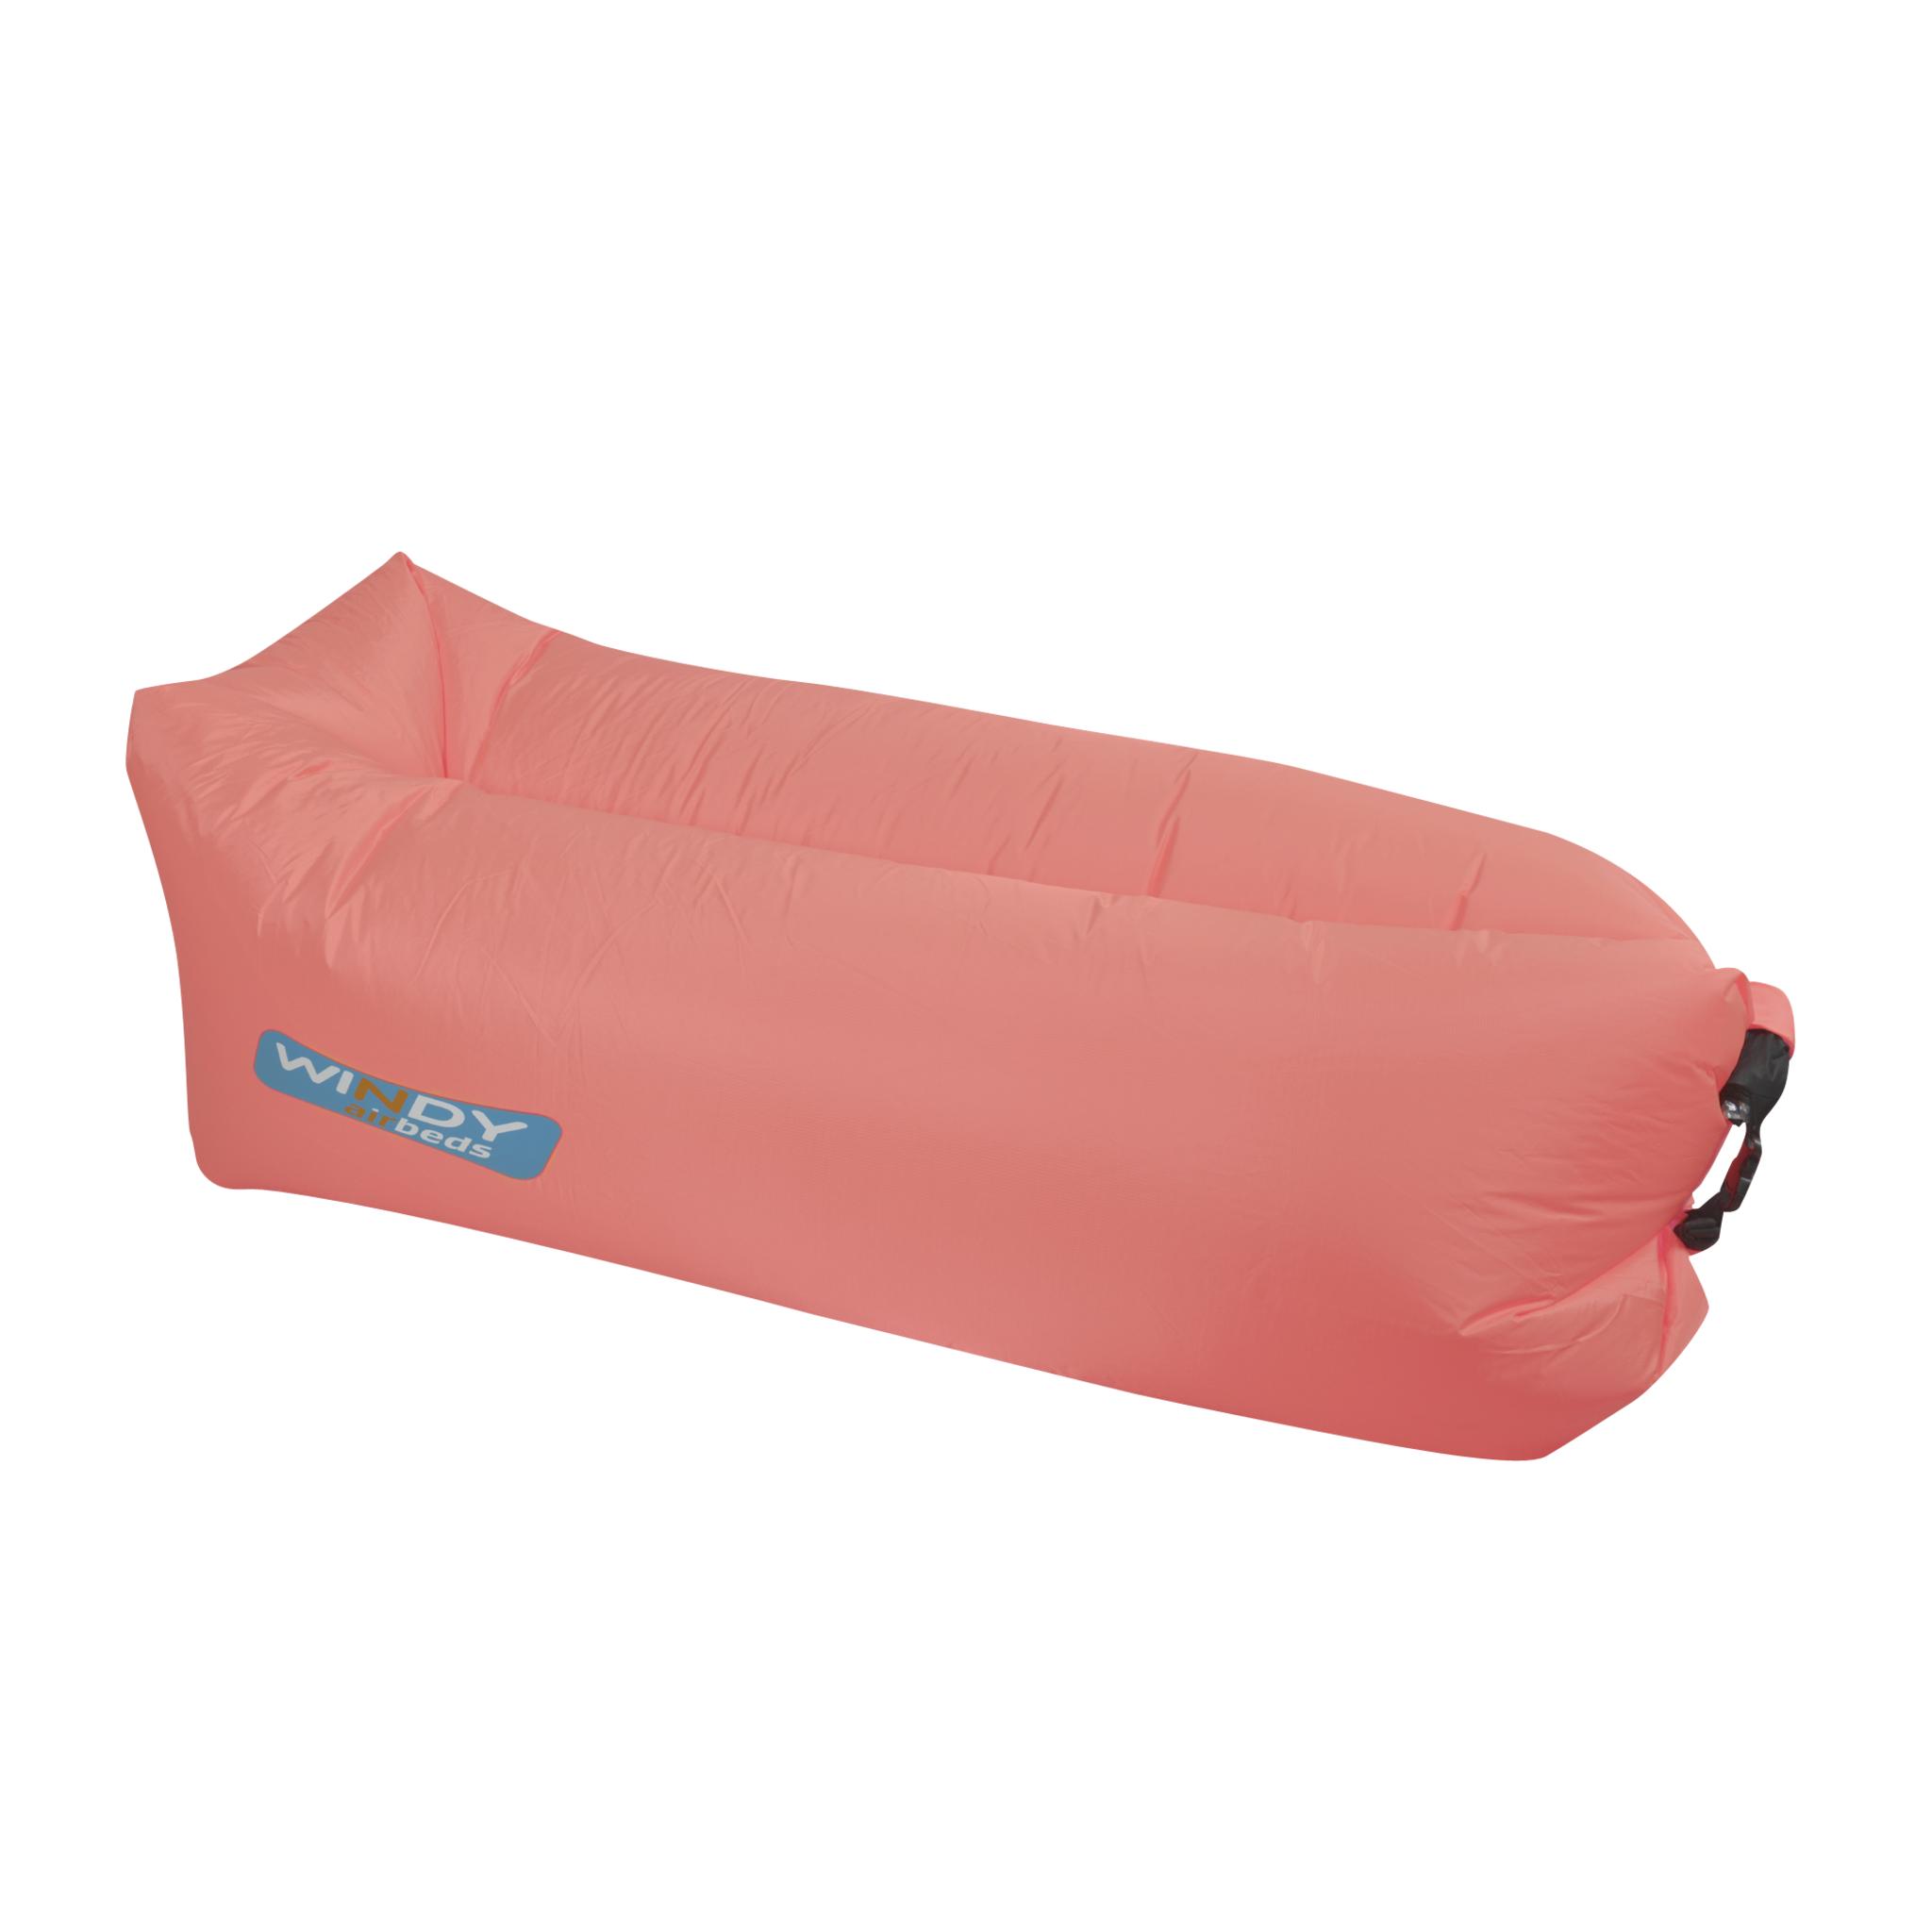 Windy Airbed, oppblåsbar sofa